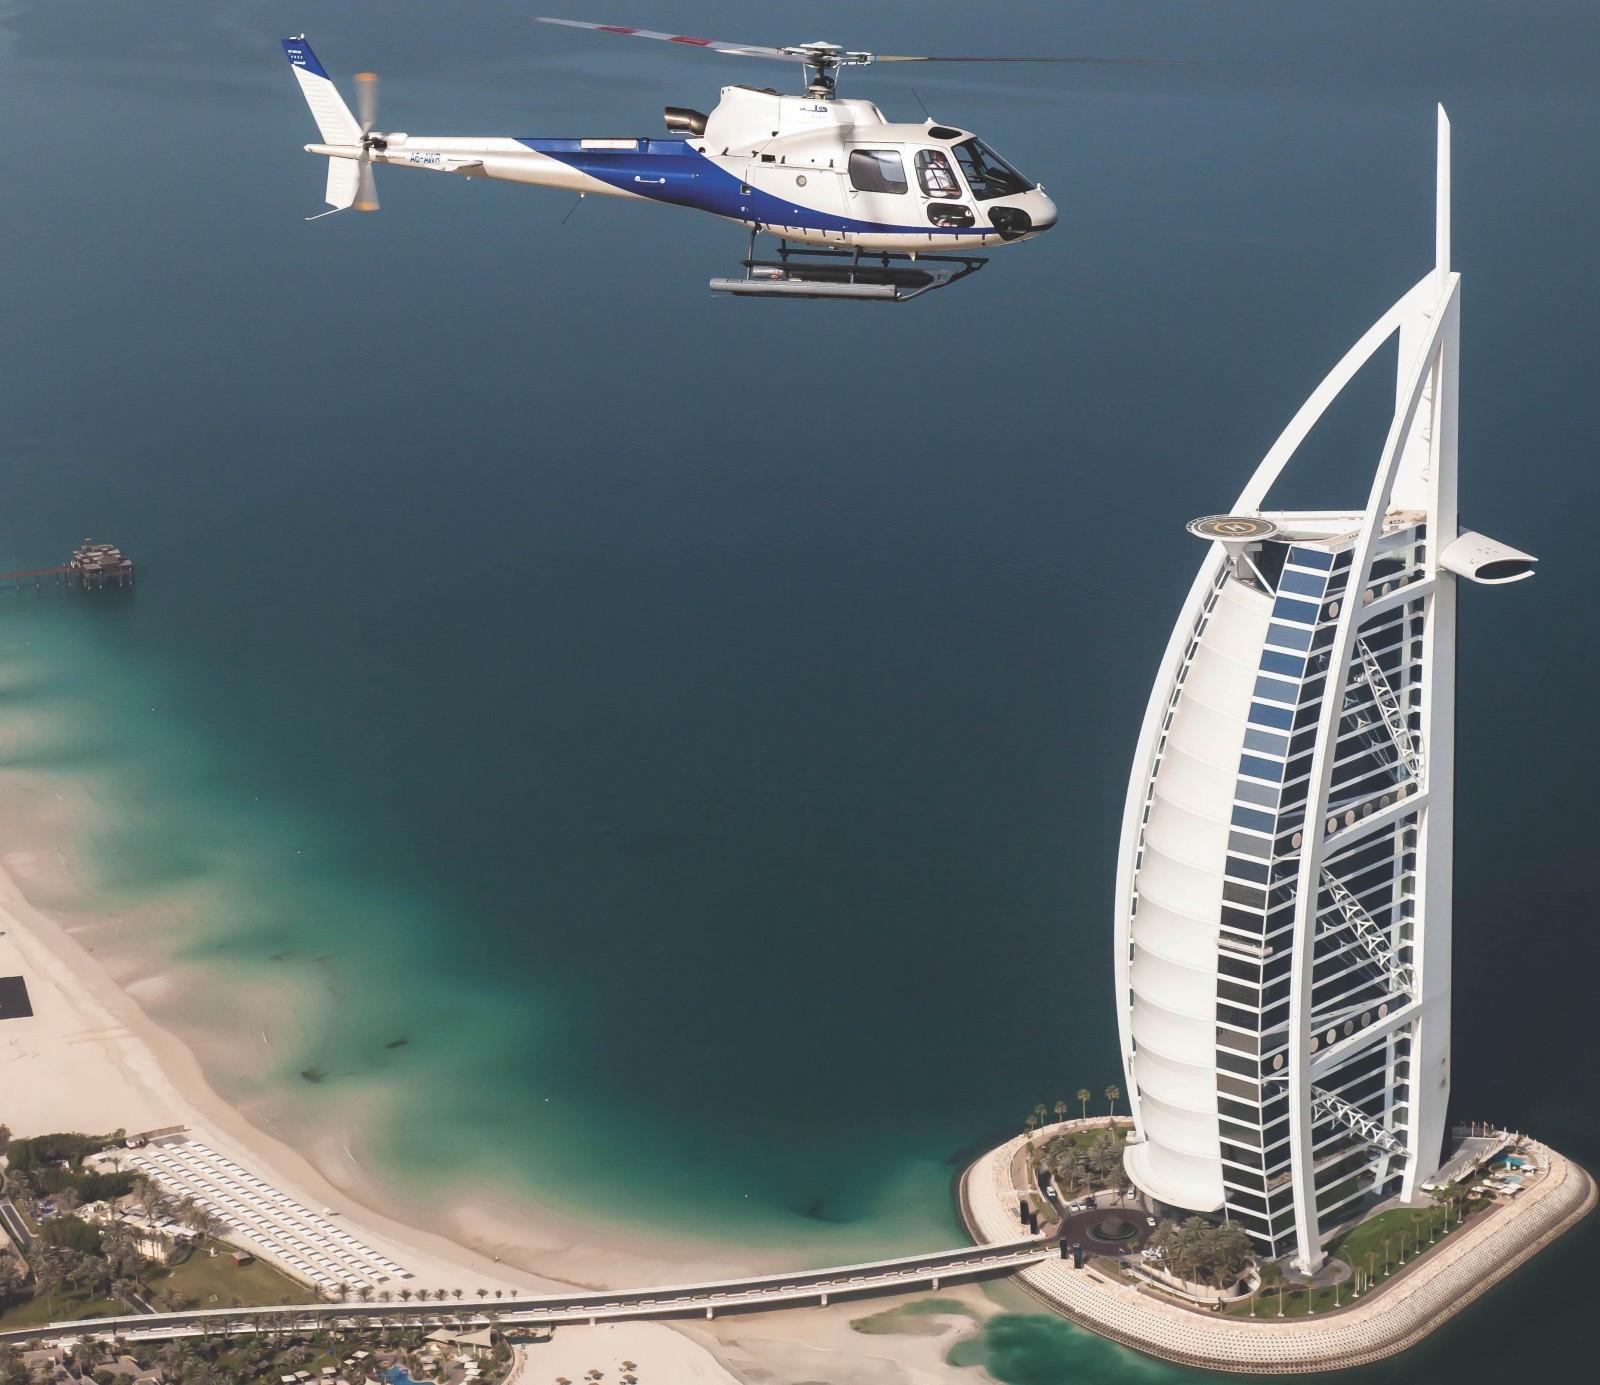 Helicopter Rides Dubai